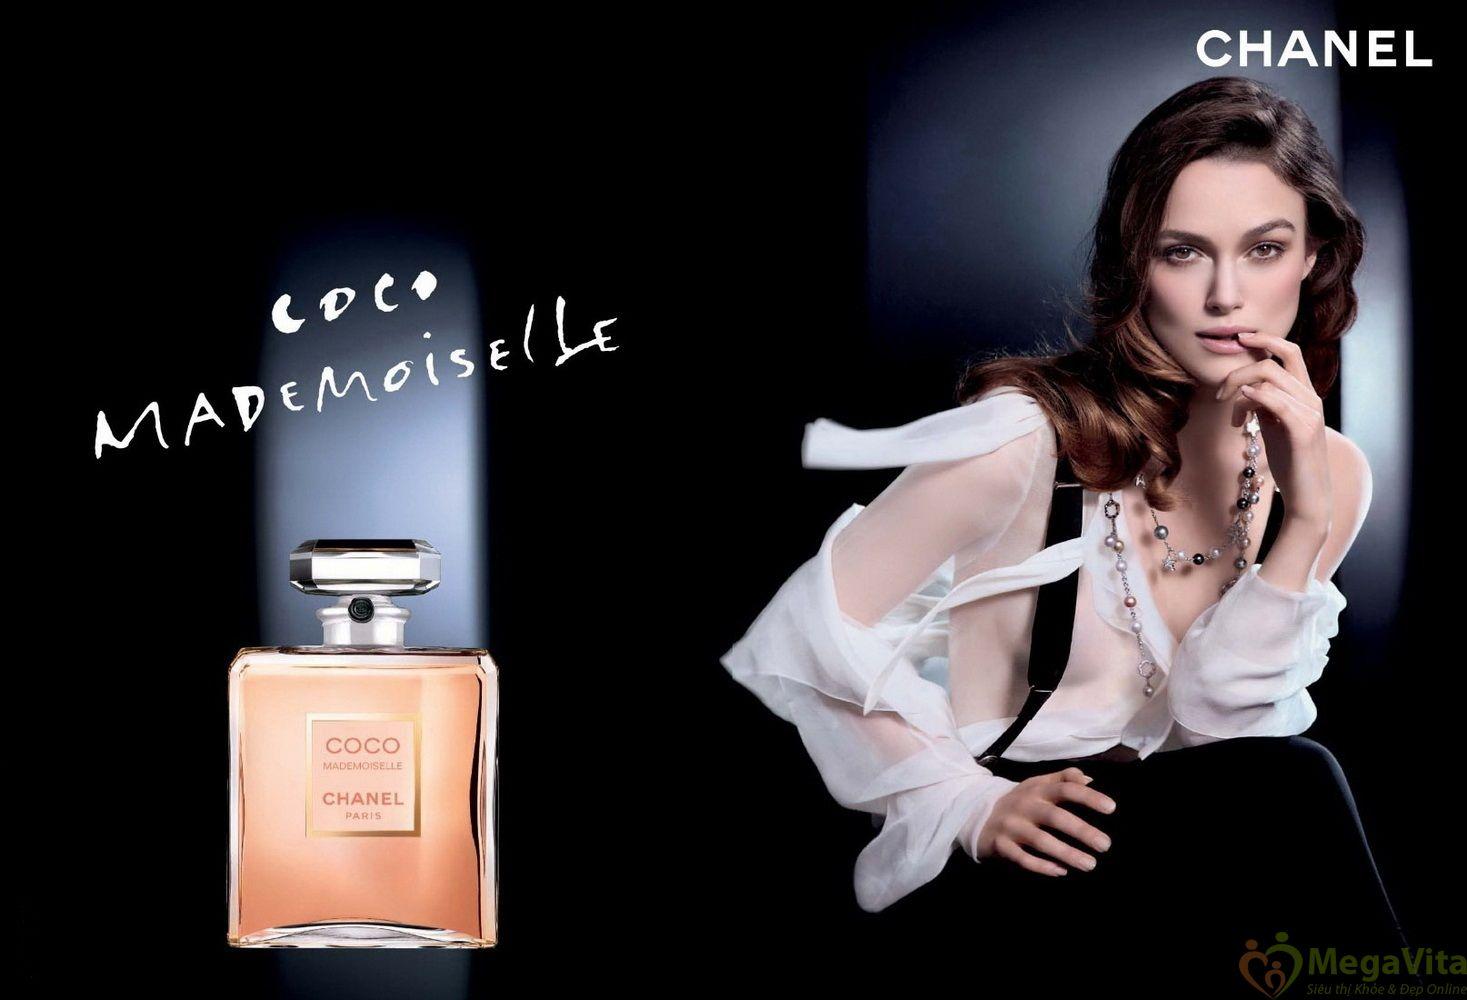 Nước hoa nữ hương hoa cỏ sang trọng, tinh tế chanel coco mademoiselle eau de parfum của pháp chai 100ml